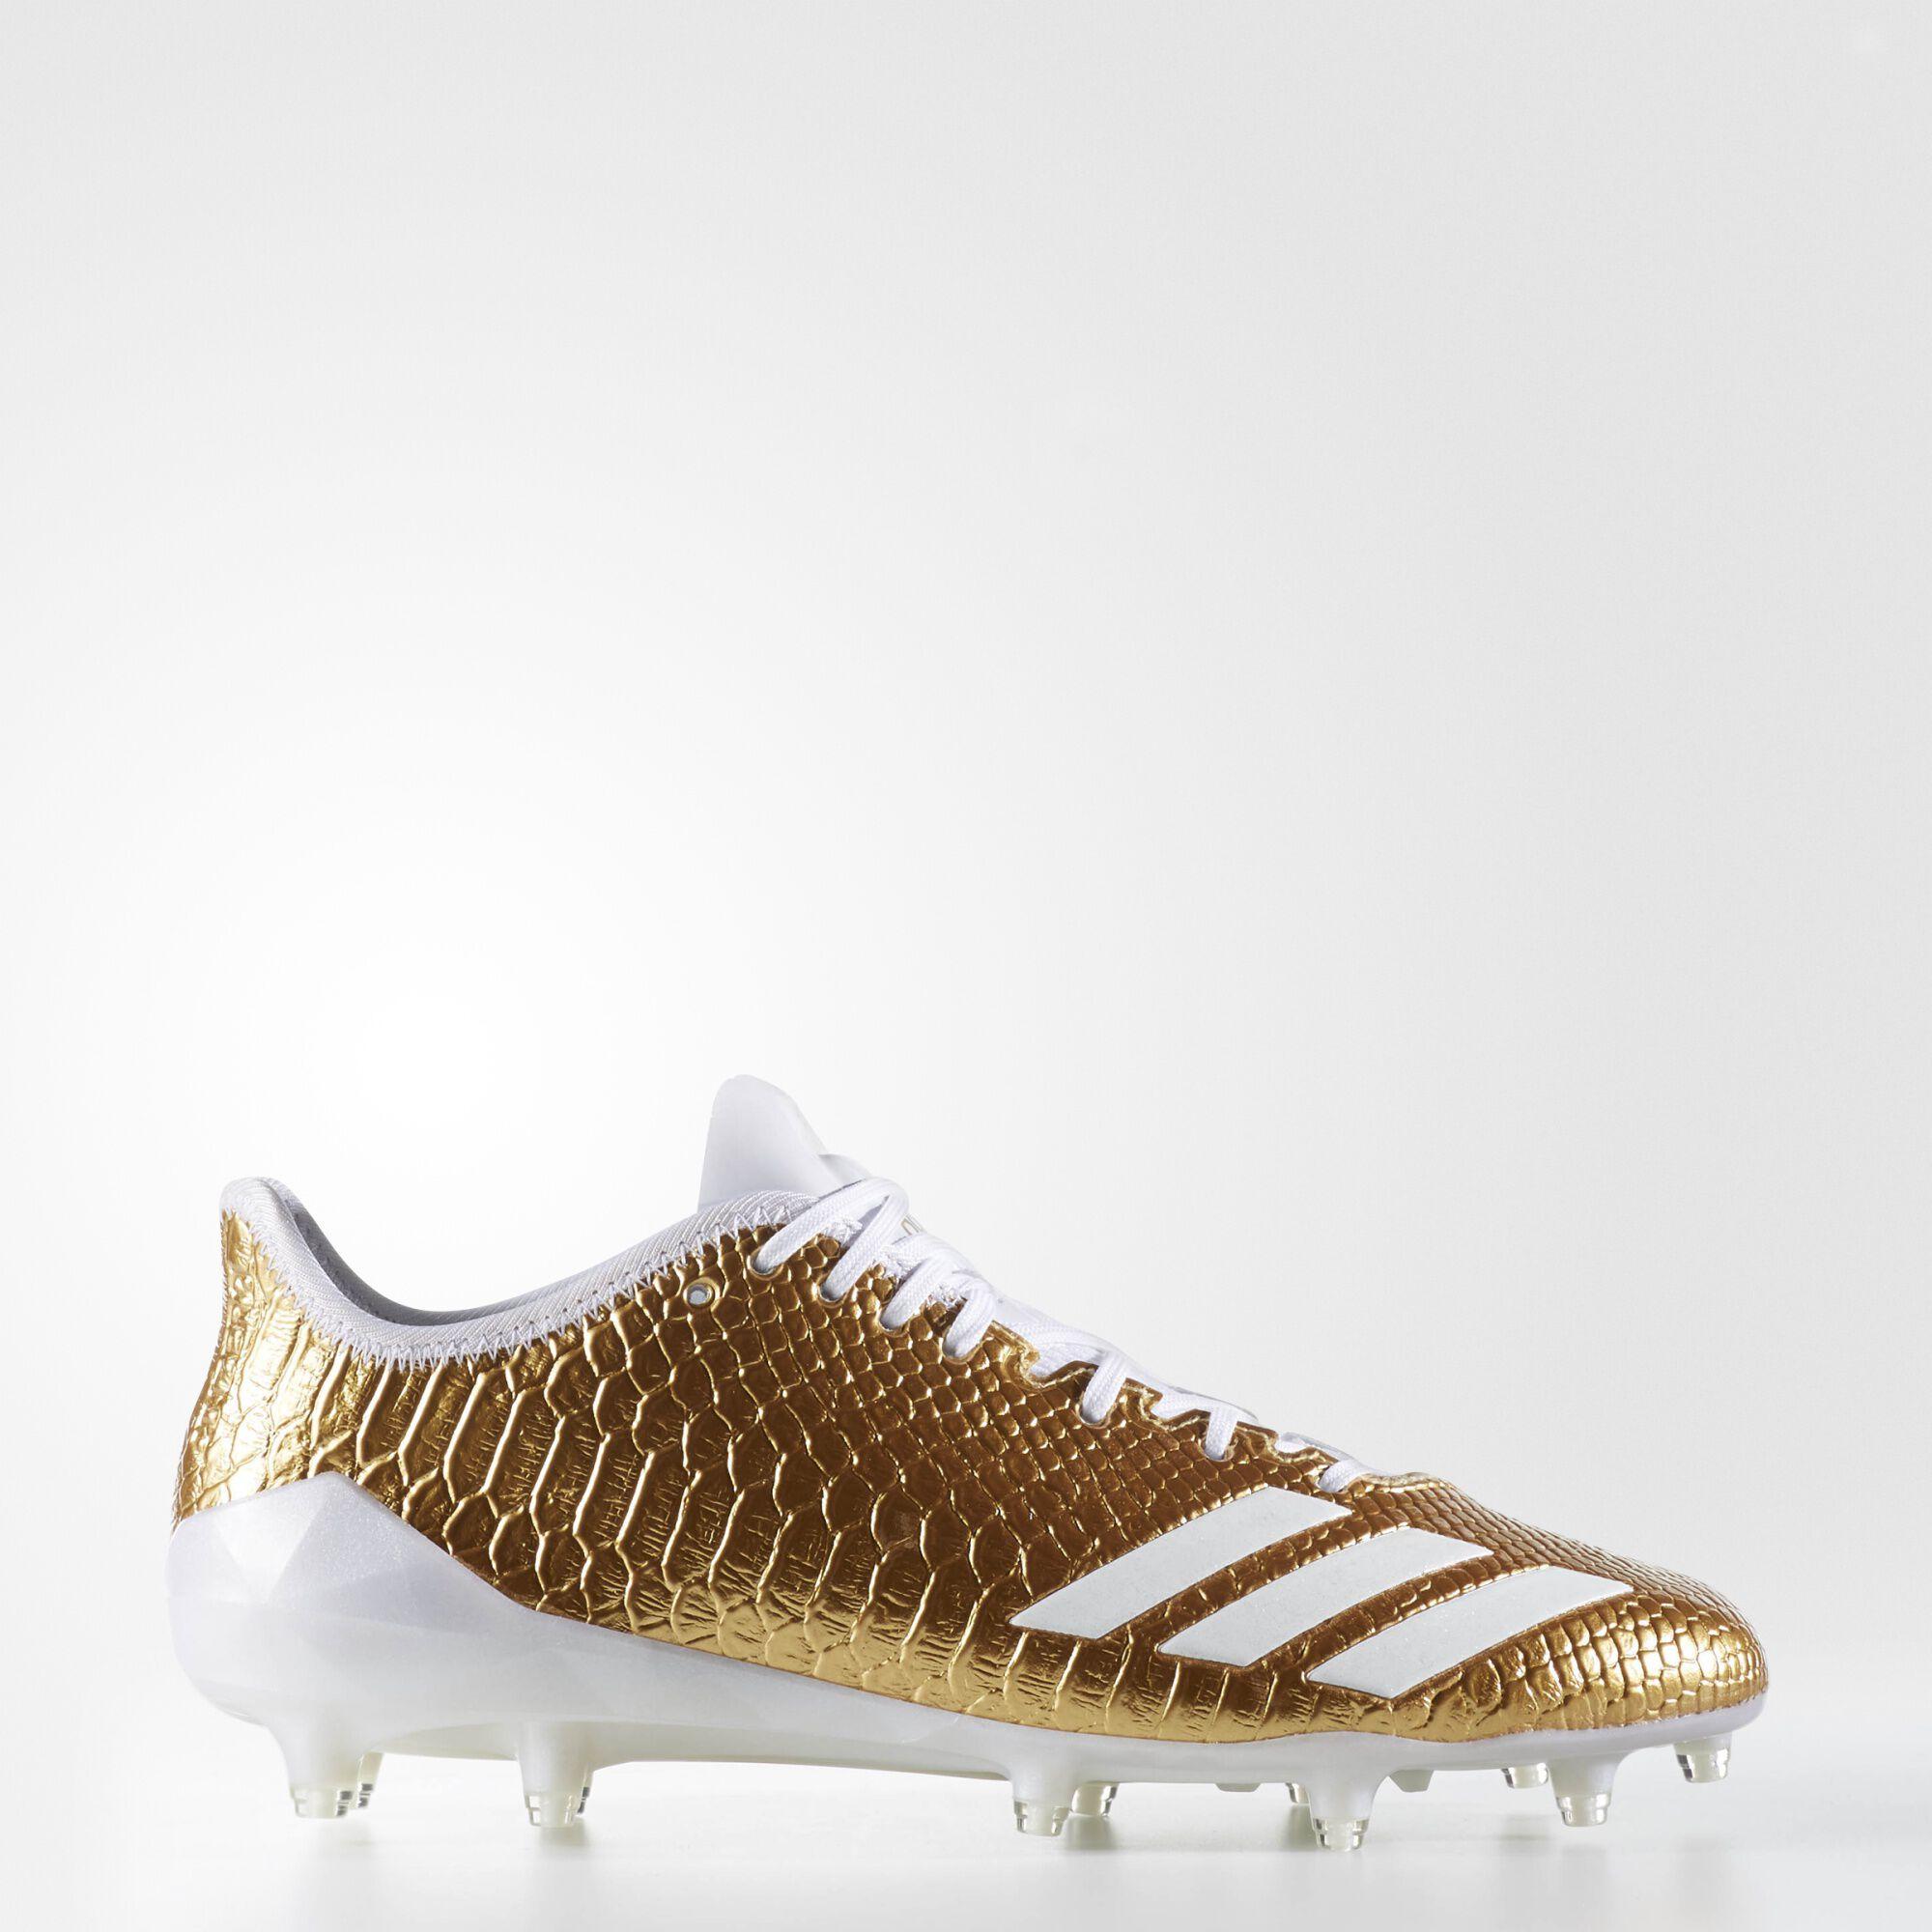 adidas adizero football cleats cheetah